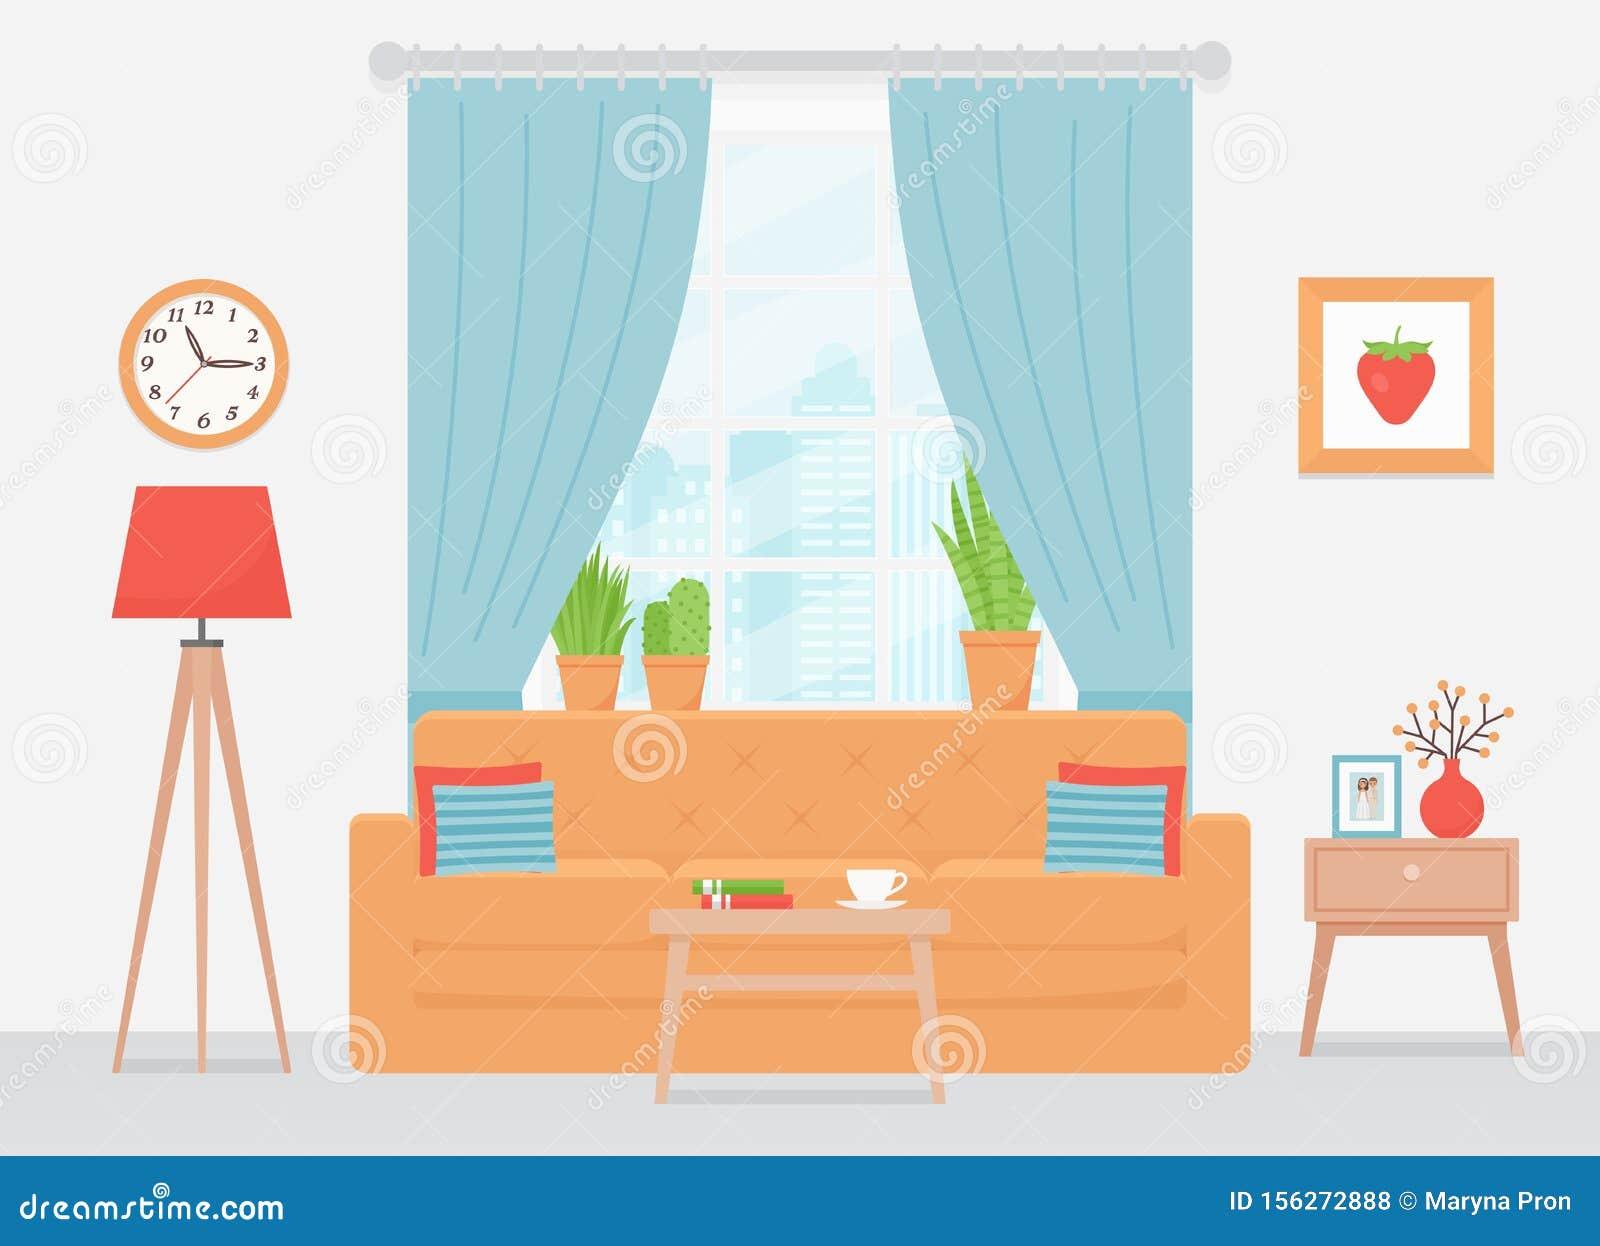 Living Room Interior Vector Illustration Flat Design Stock Vector Illustration Of Colorful Blue 156272888